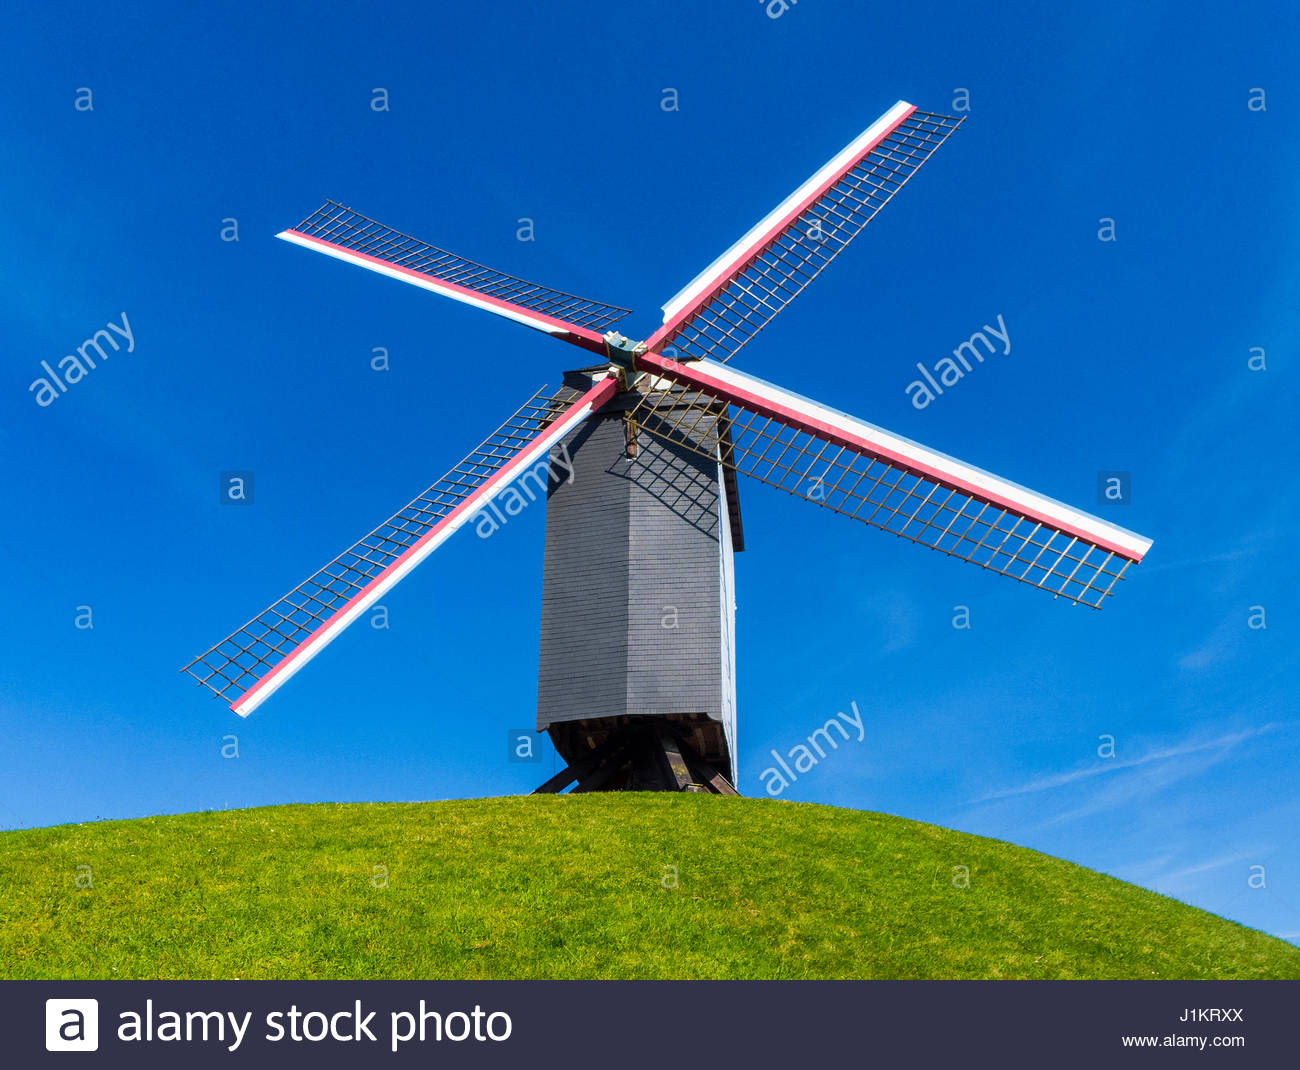 Belgium, West Flanders (Vlaanderen), Bruges (Brugge). Bonne Chieremolen windmill on the Kruisvest park. - Stock Image